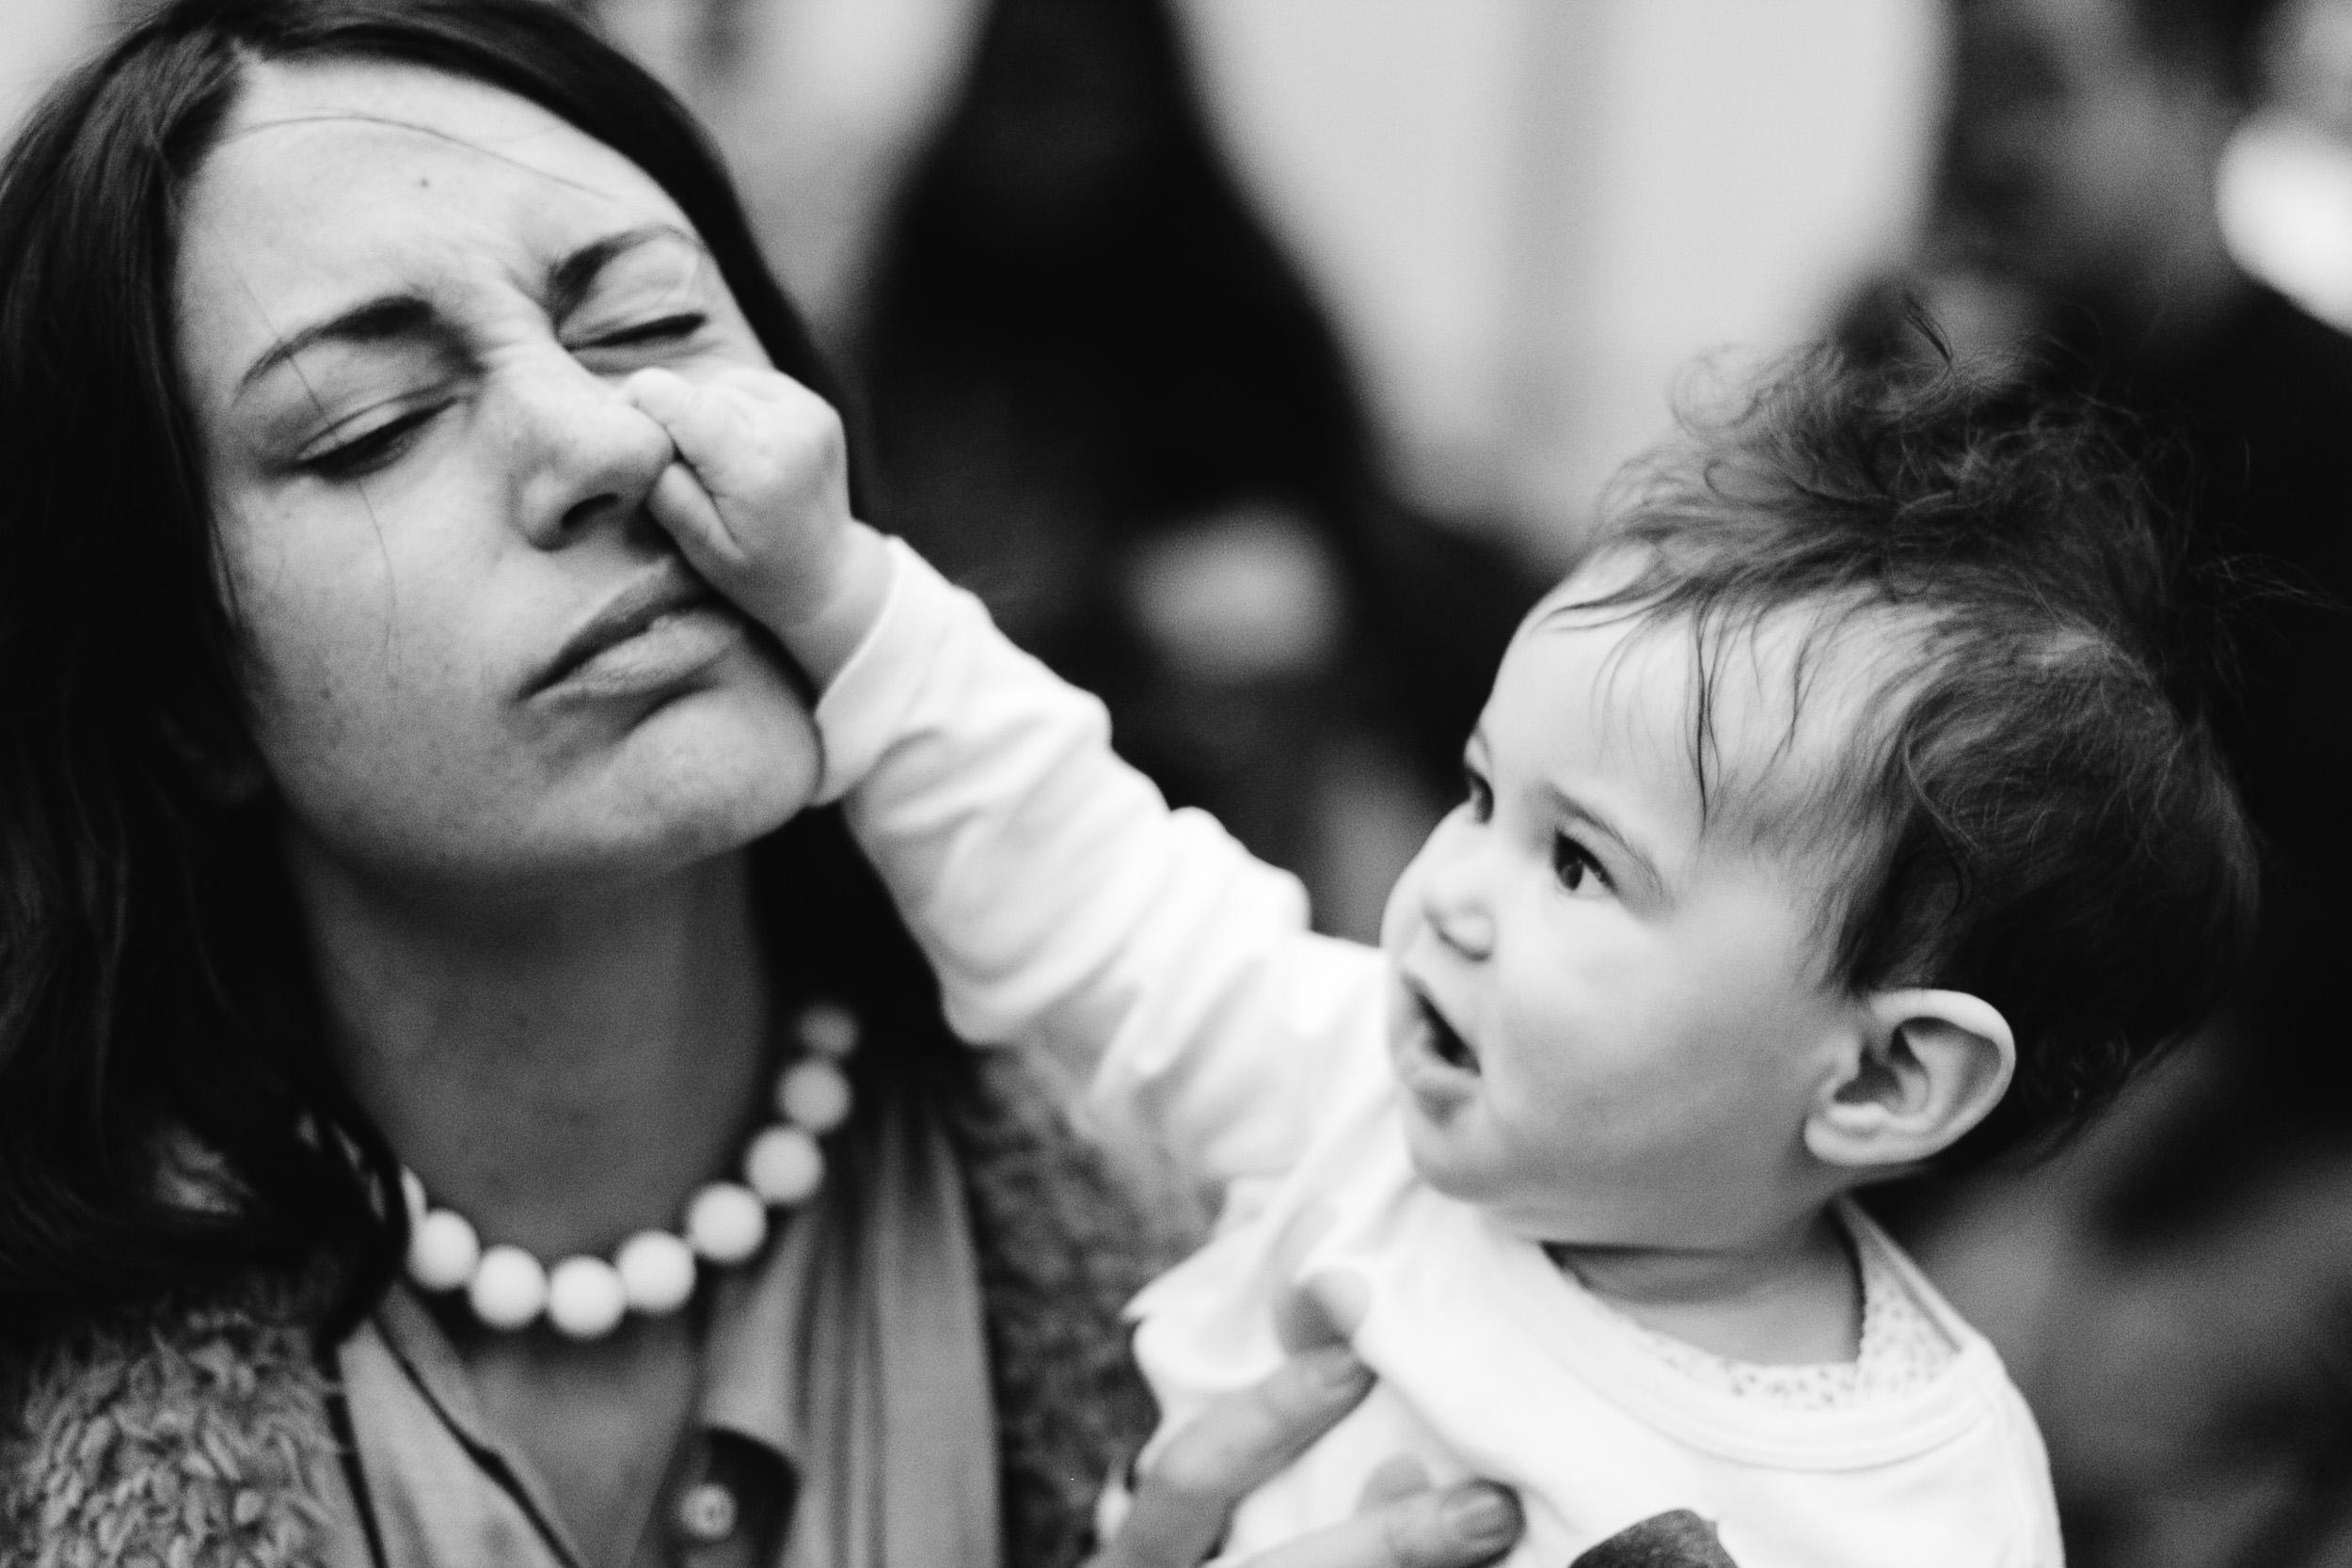 Deborah-Barak-Documentary-Family-Photography-Brooklyn_NYC_baby-finger-in-moms-nose.jpg